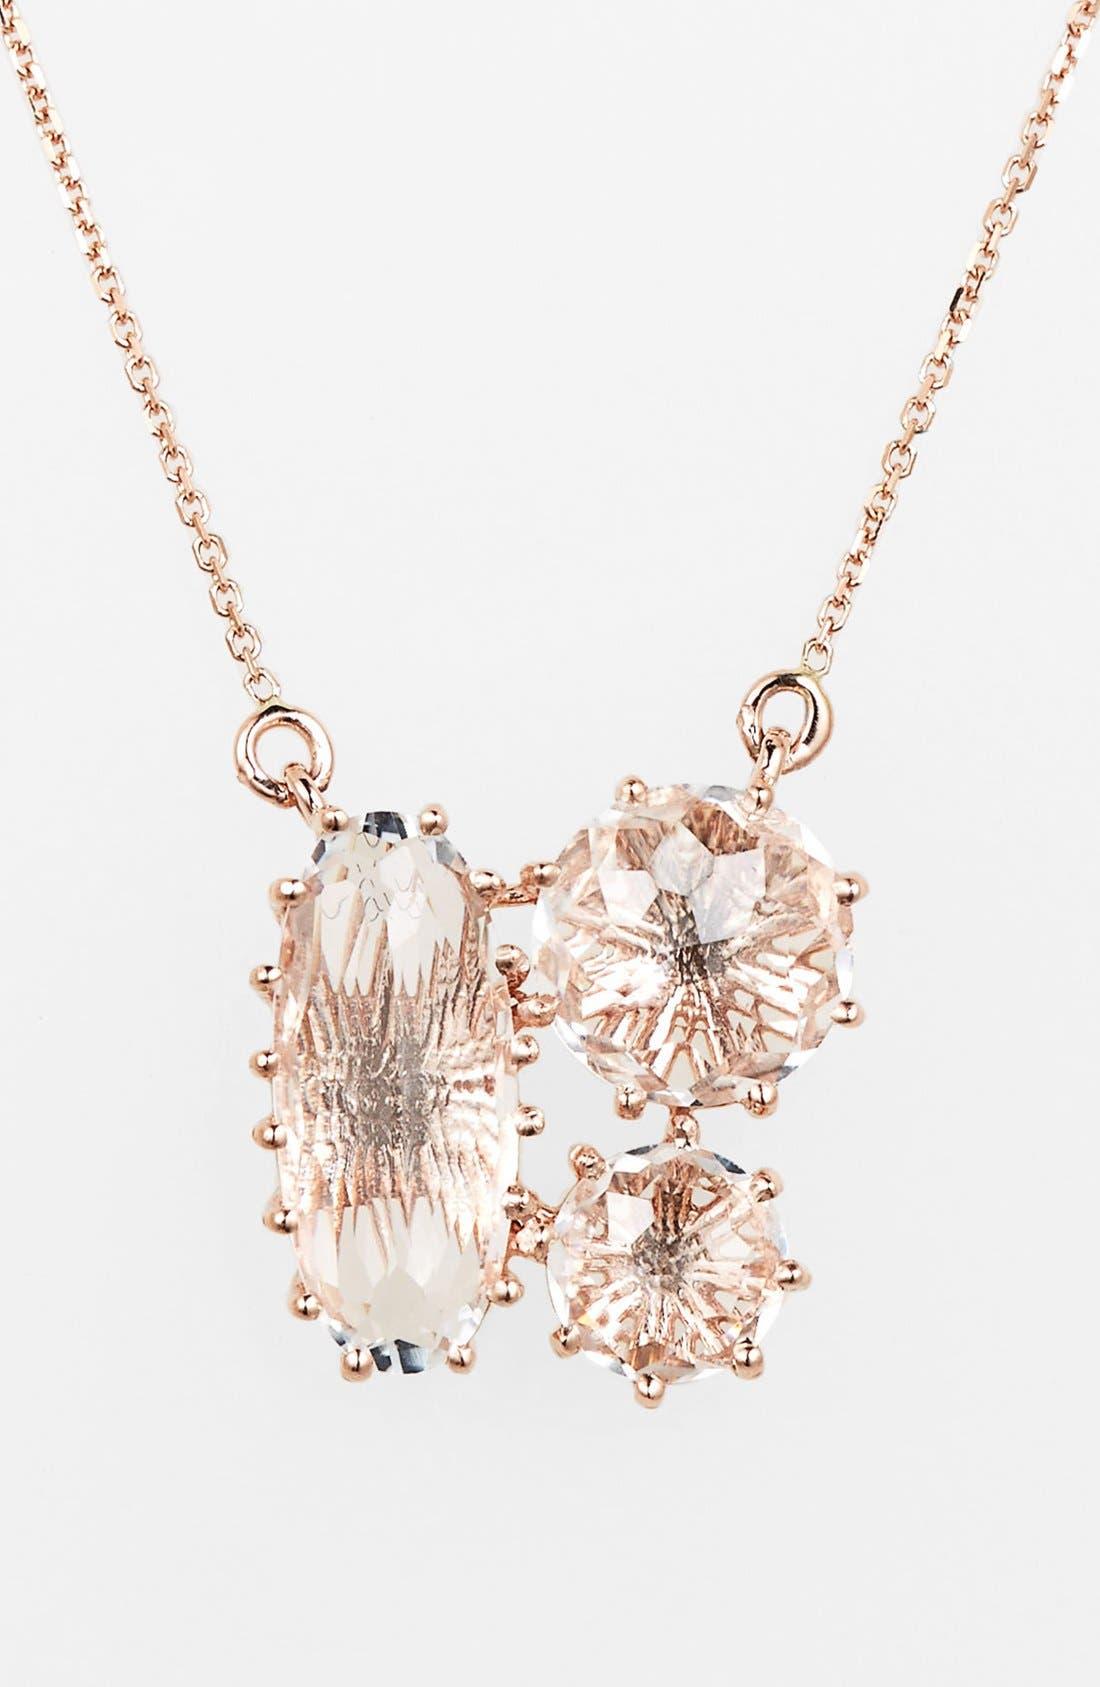 Alternate Image 1 Selected - KALAN by Suzanne Kalan Stone Cluster Pendant Necklace